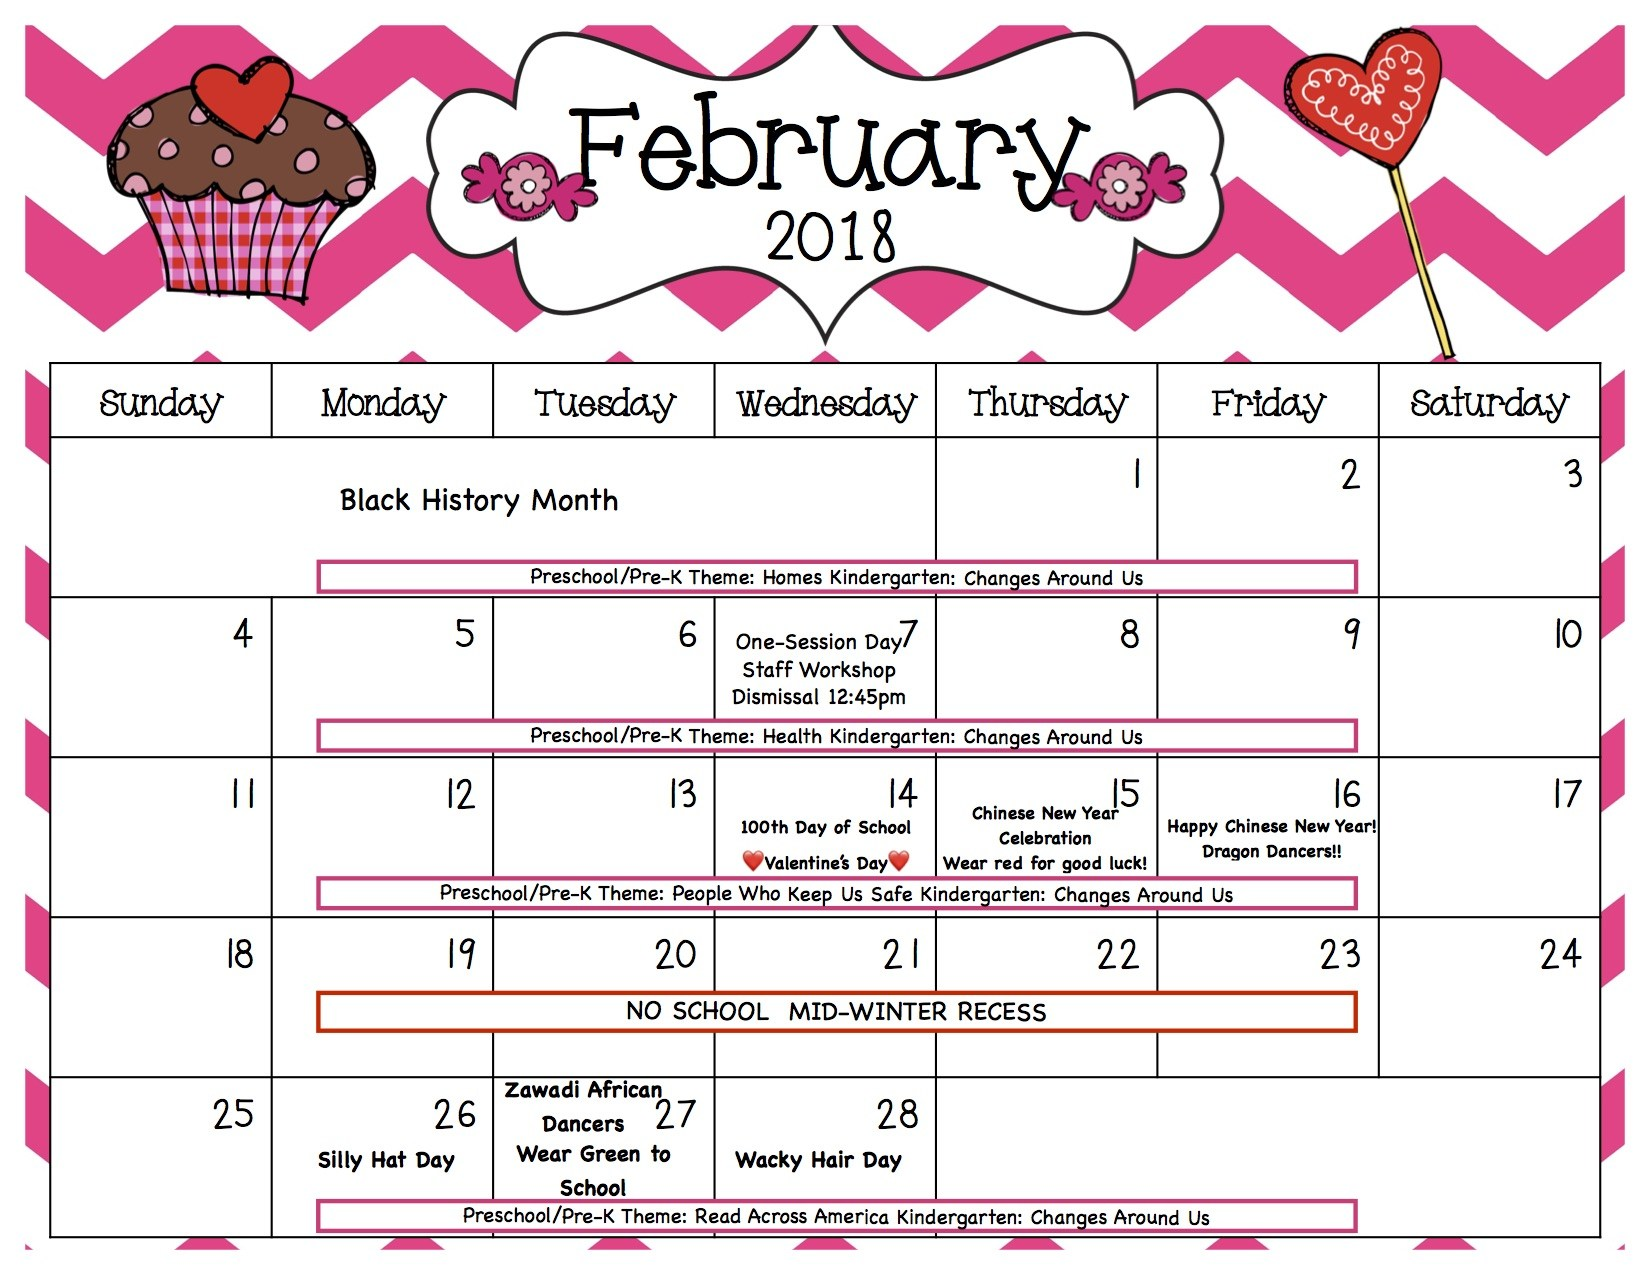 Revised February Calendar